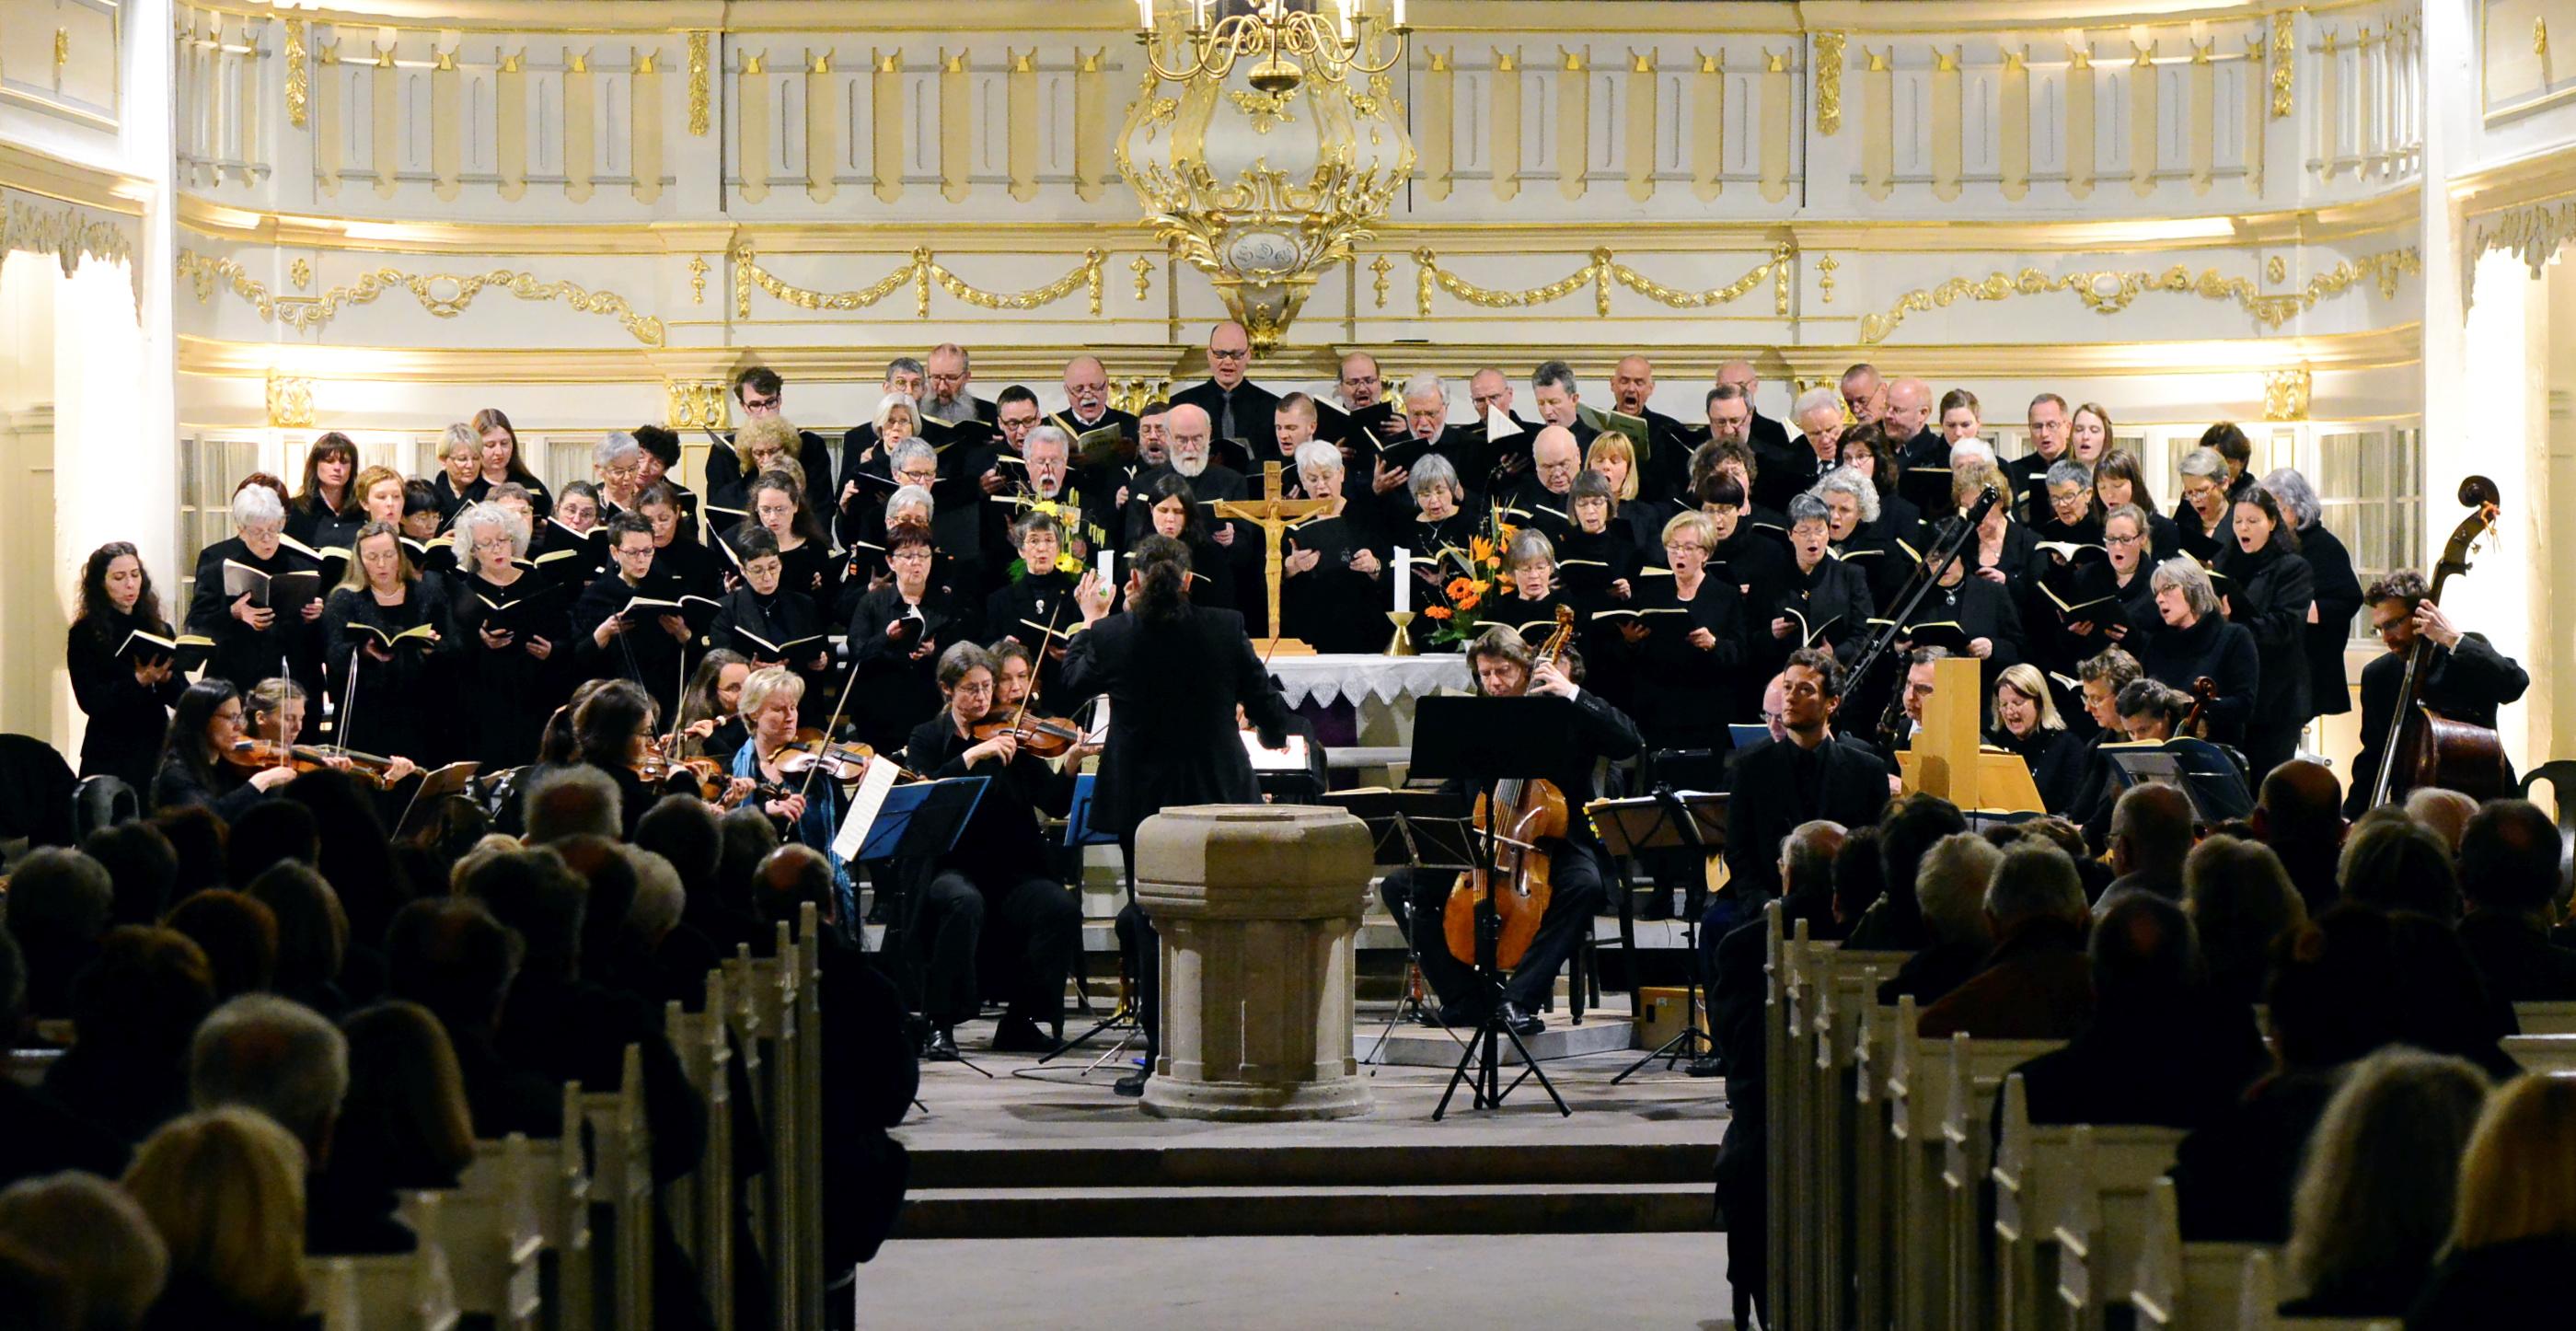 Bach-Festival in Arnstadt - die Johasses-Passion BWV 245 mit Kantor Jörg Reddin und dem Bachchor Arnstadt, Foto: H.-P. Stadermann